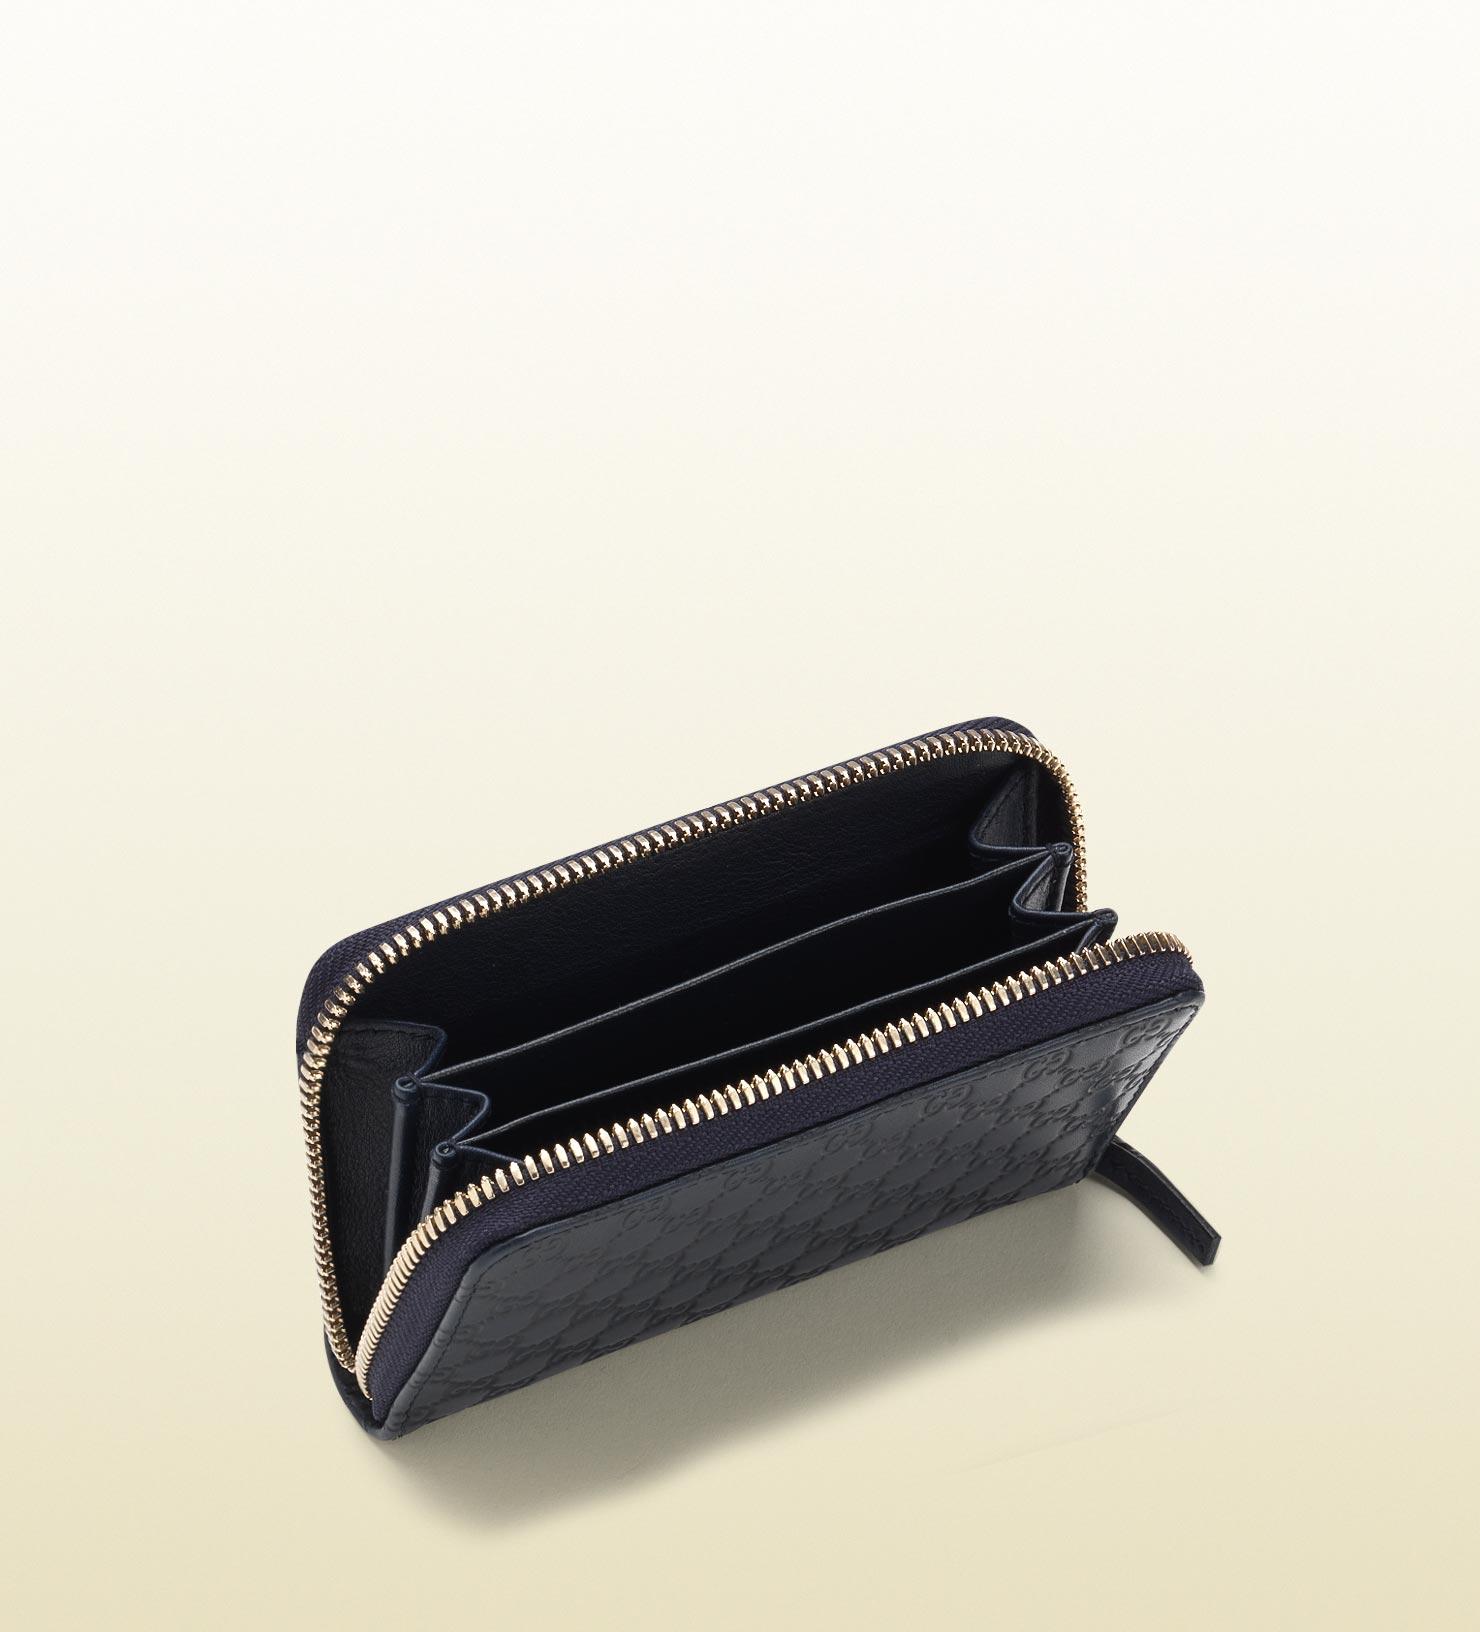 online retailer ecf1e fc6ec Gucci Blue Zip Around Card Case for men